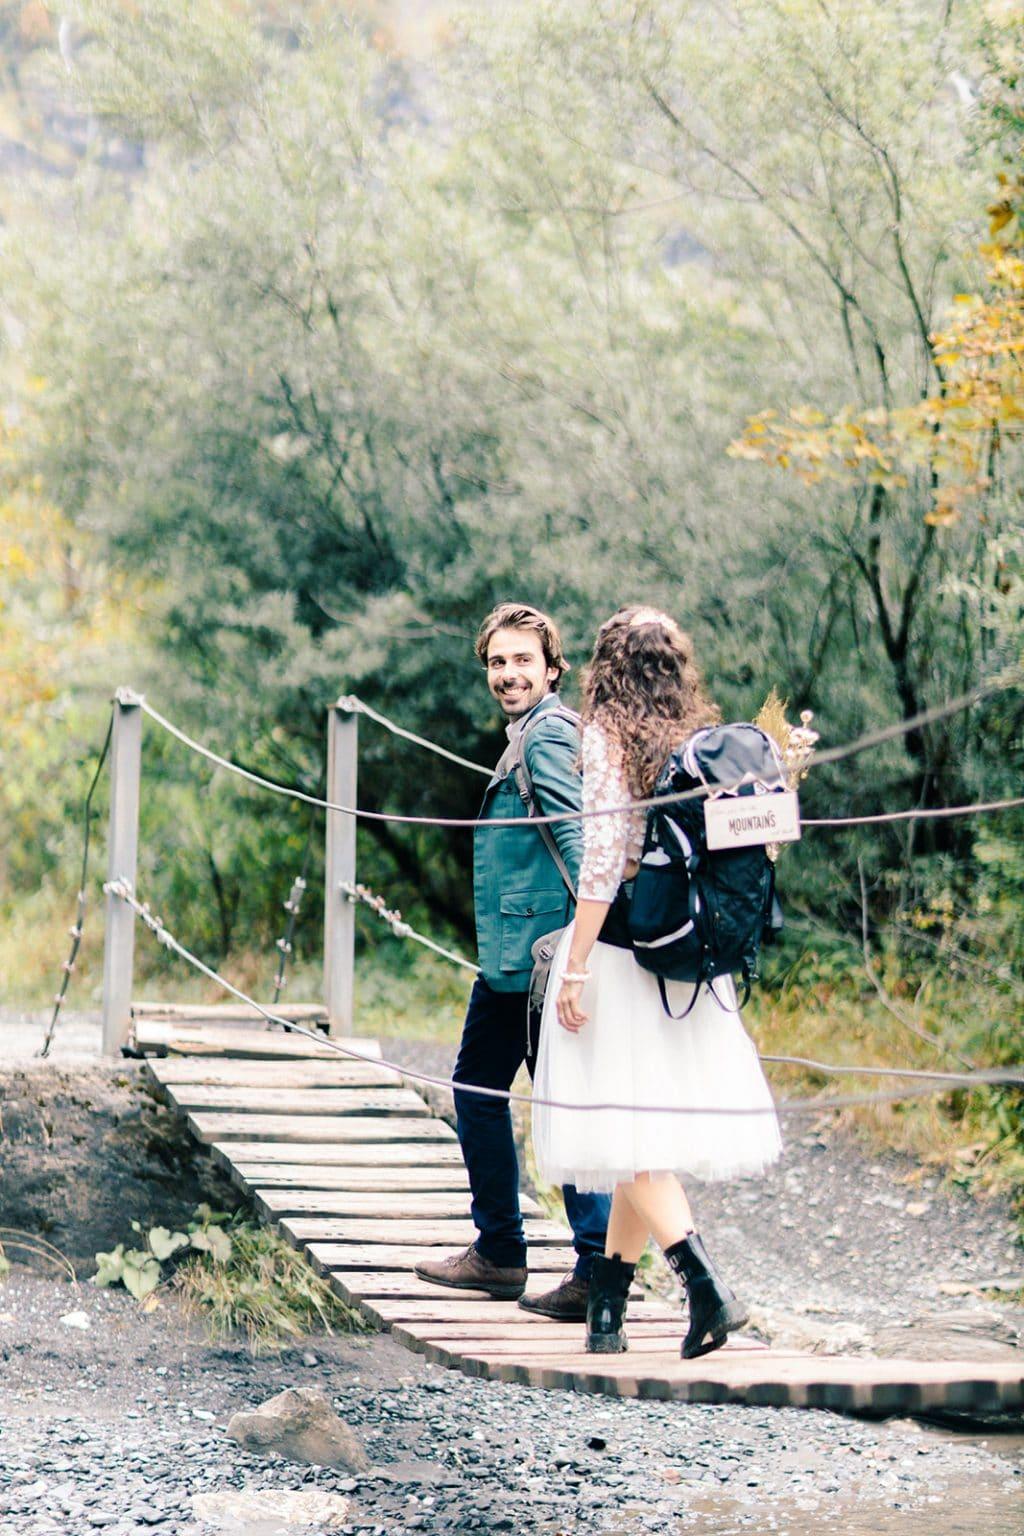 elopement-mariage aventures-nature-alpes-maries